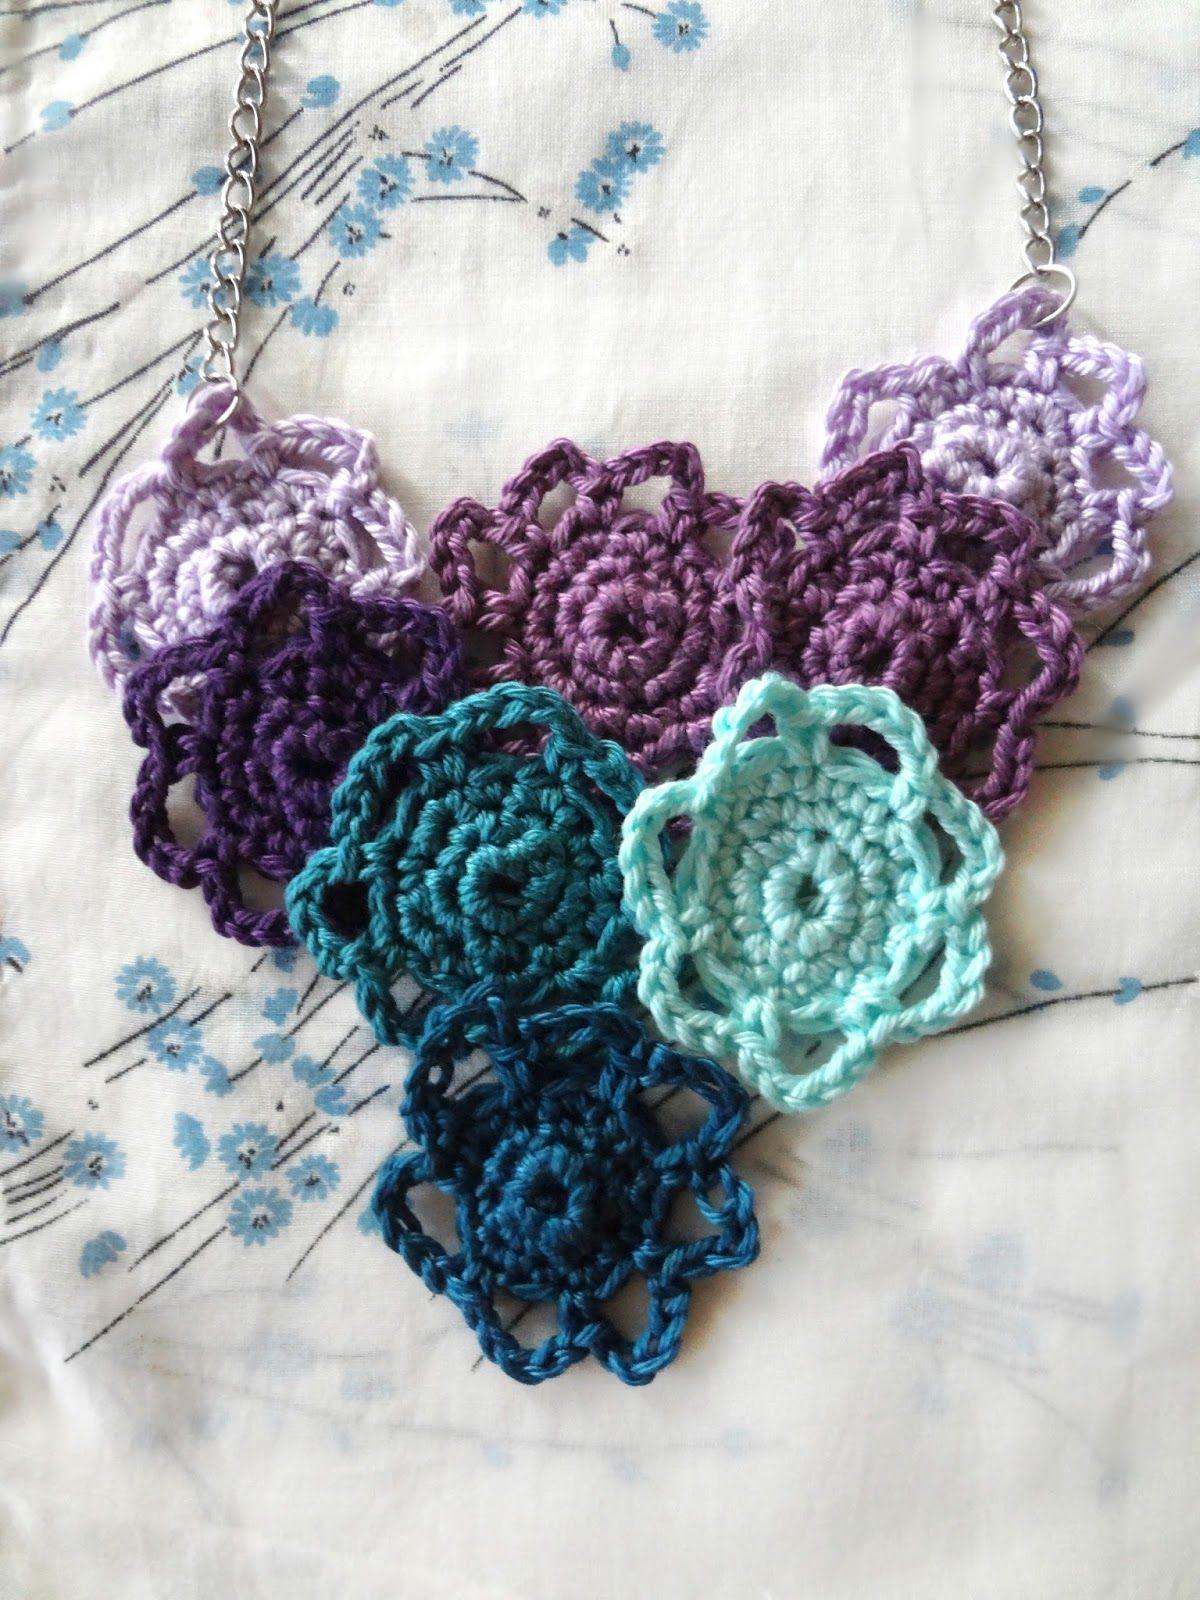 Little Rosettes Necklace | Crochet Projects | Pinterest | Rosettes ...